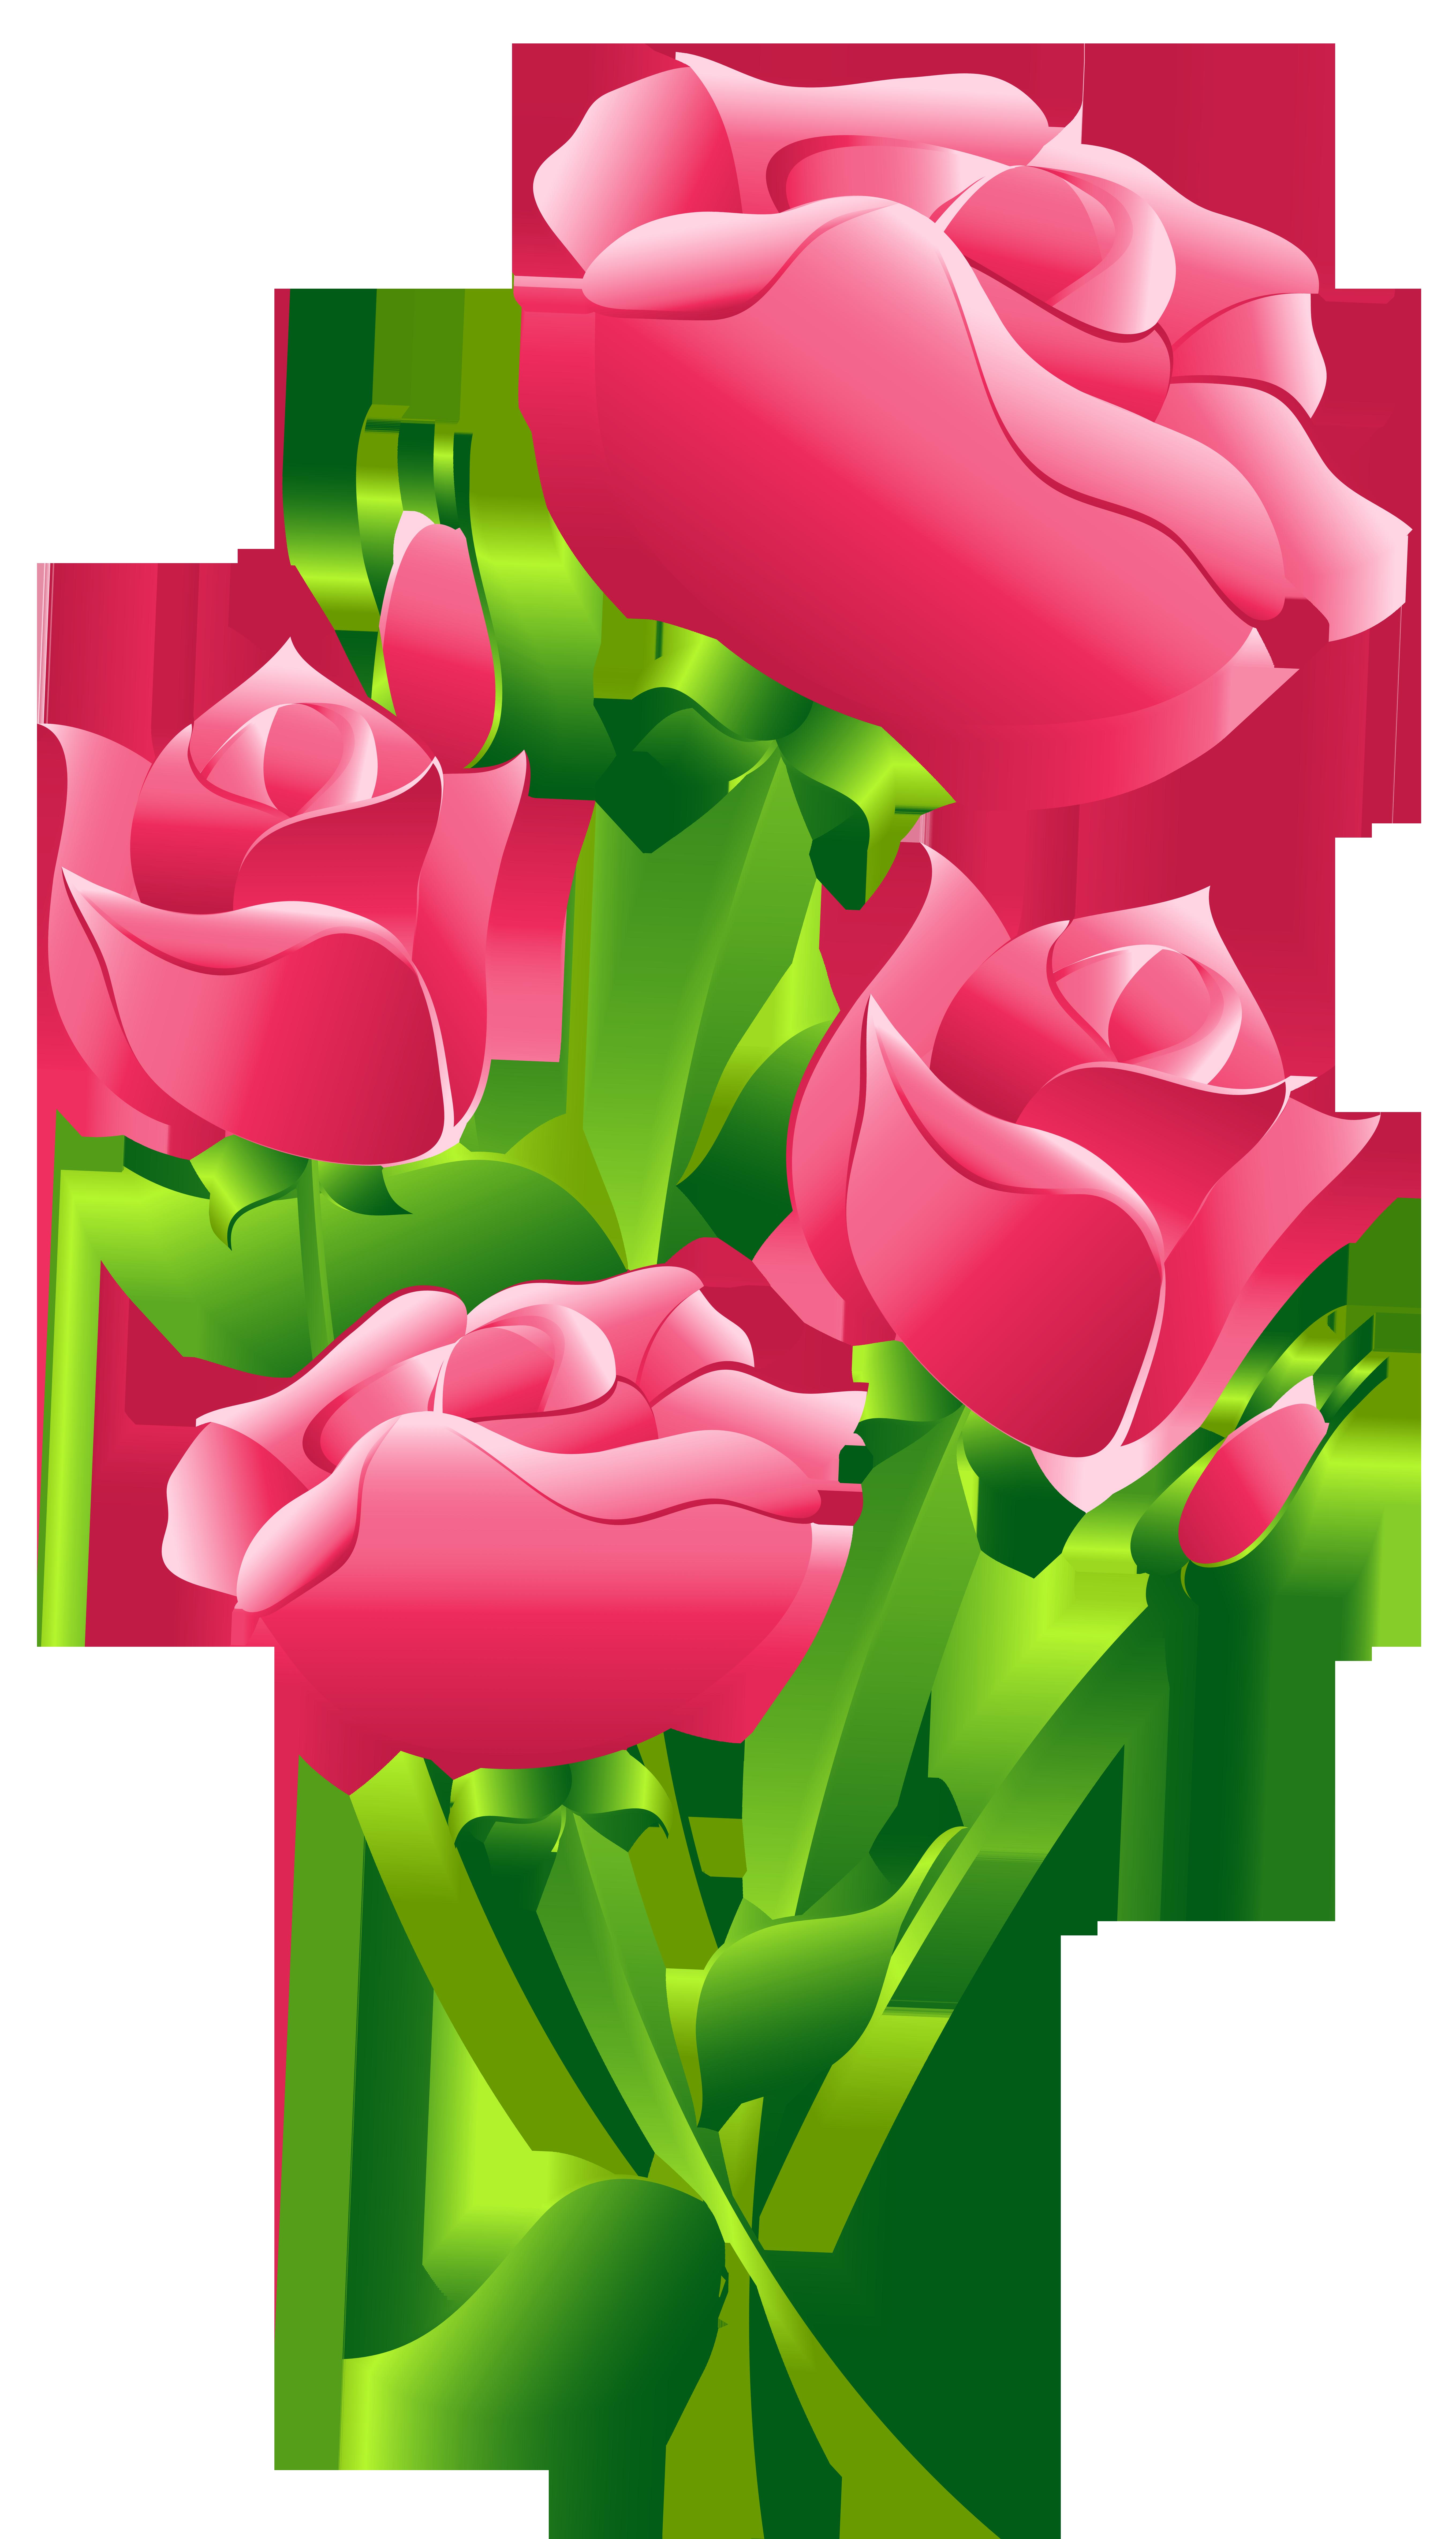 5434x9473 Pink Roses Transparent Png Clip Art Imageu200b Gallery Yopriceville